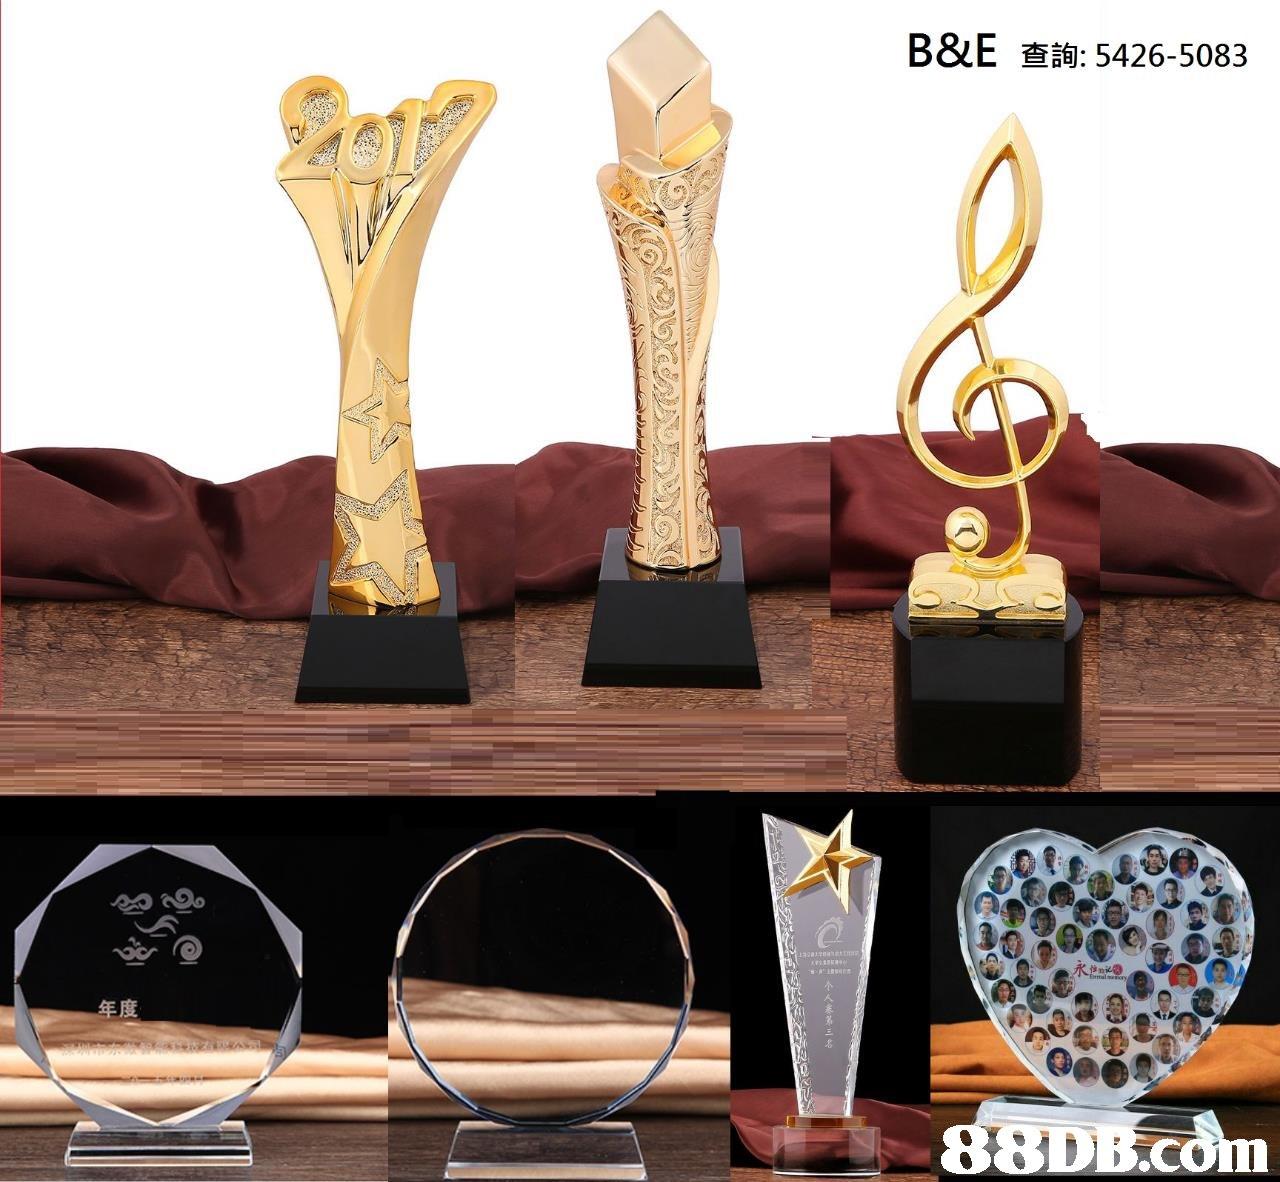 B&E 查詢:5426-5083 年度  trophy,product